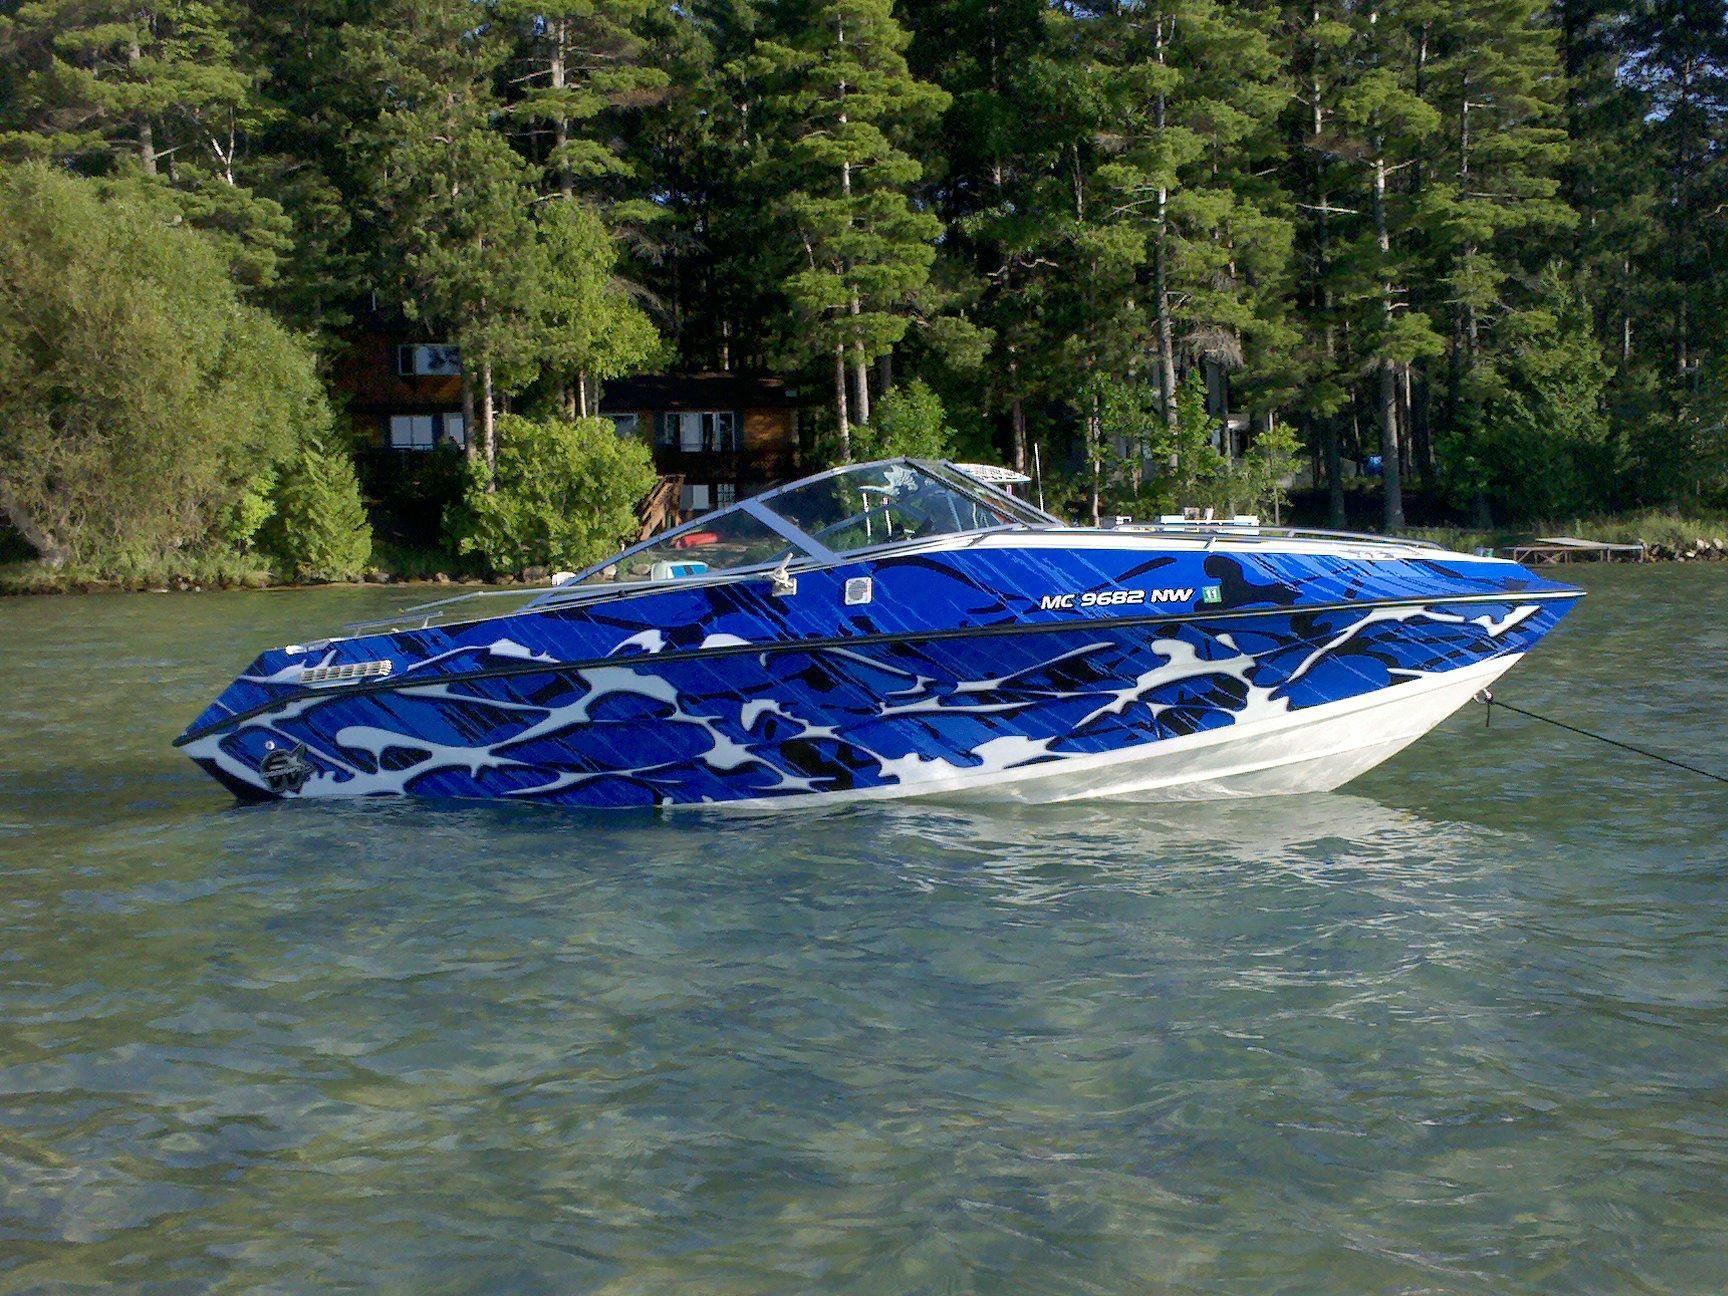 Boat wrap wraps baja rinker crownline momba mastercraft boat boat wrap wraps baja rinker crownline momba mastercraft boat fandeluxe Gallery